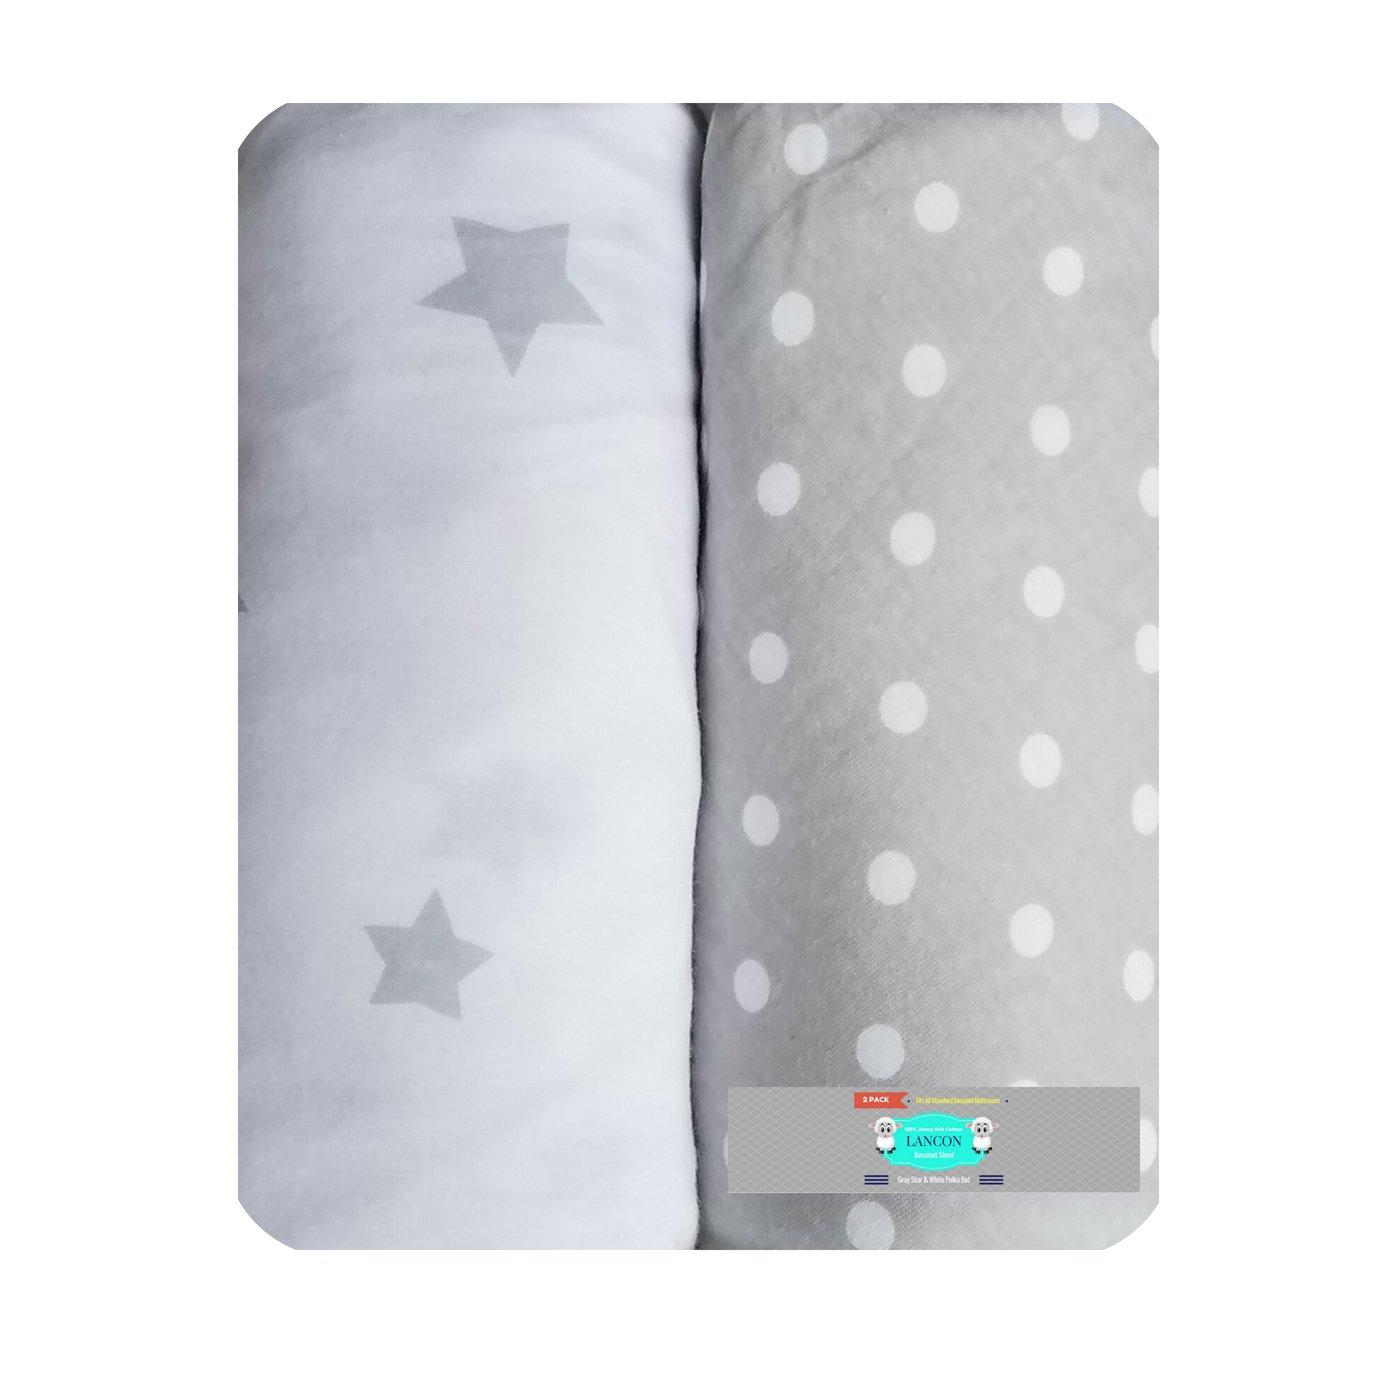 2 Pack 100/% Jersey Knit Cotton Bassinet Sheet Set by LANCON Kids Gray Star /& White Polka Dot